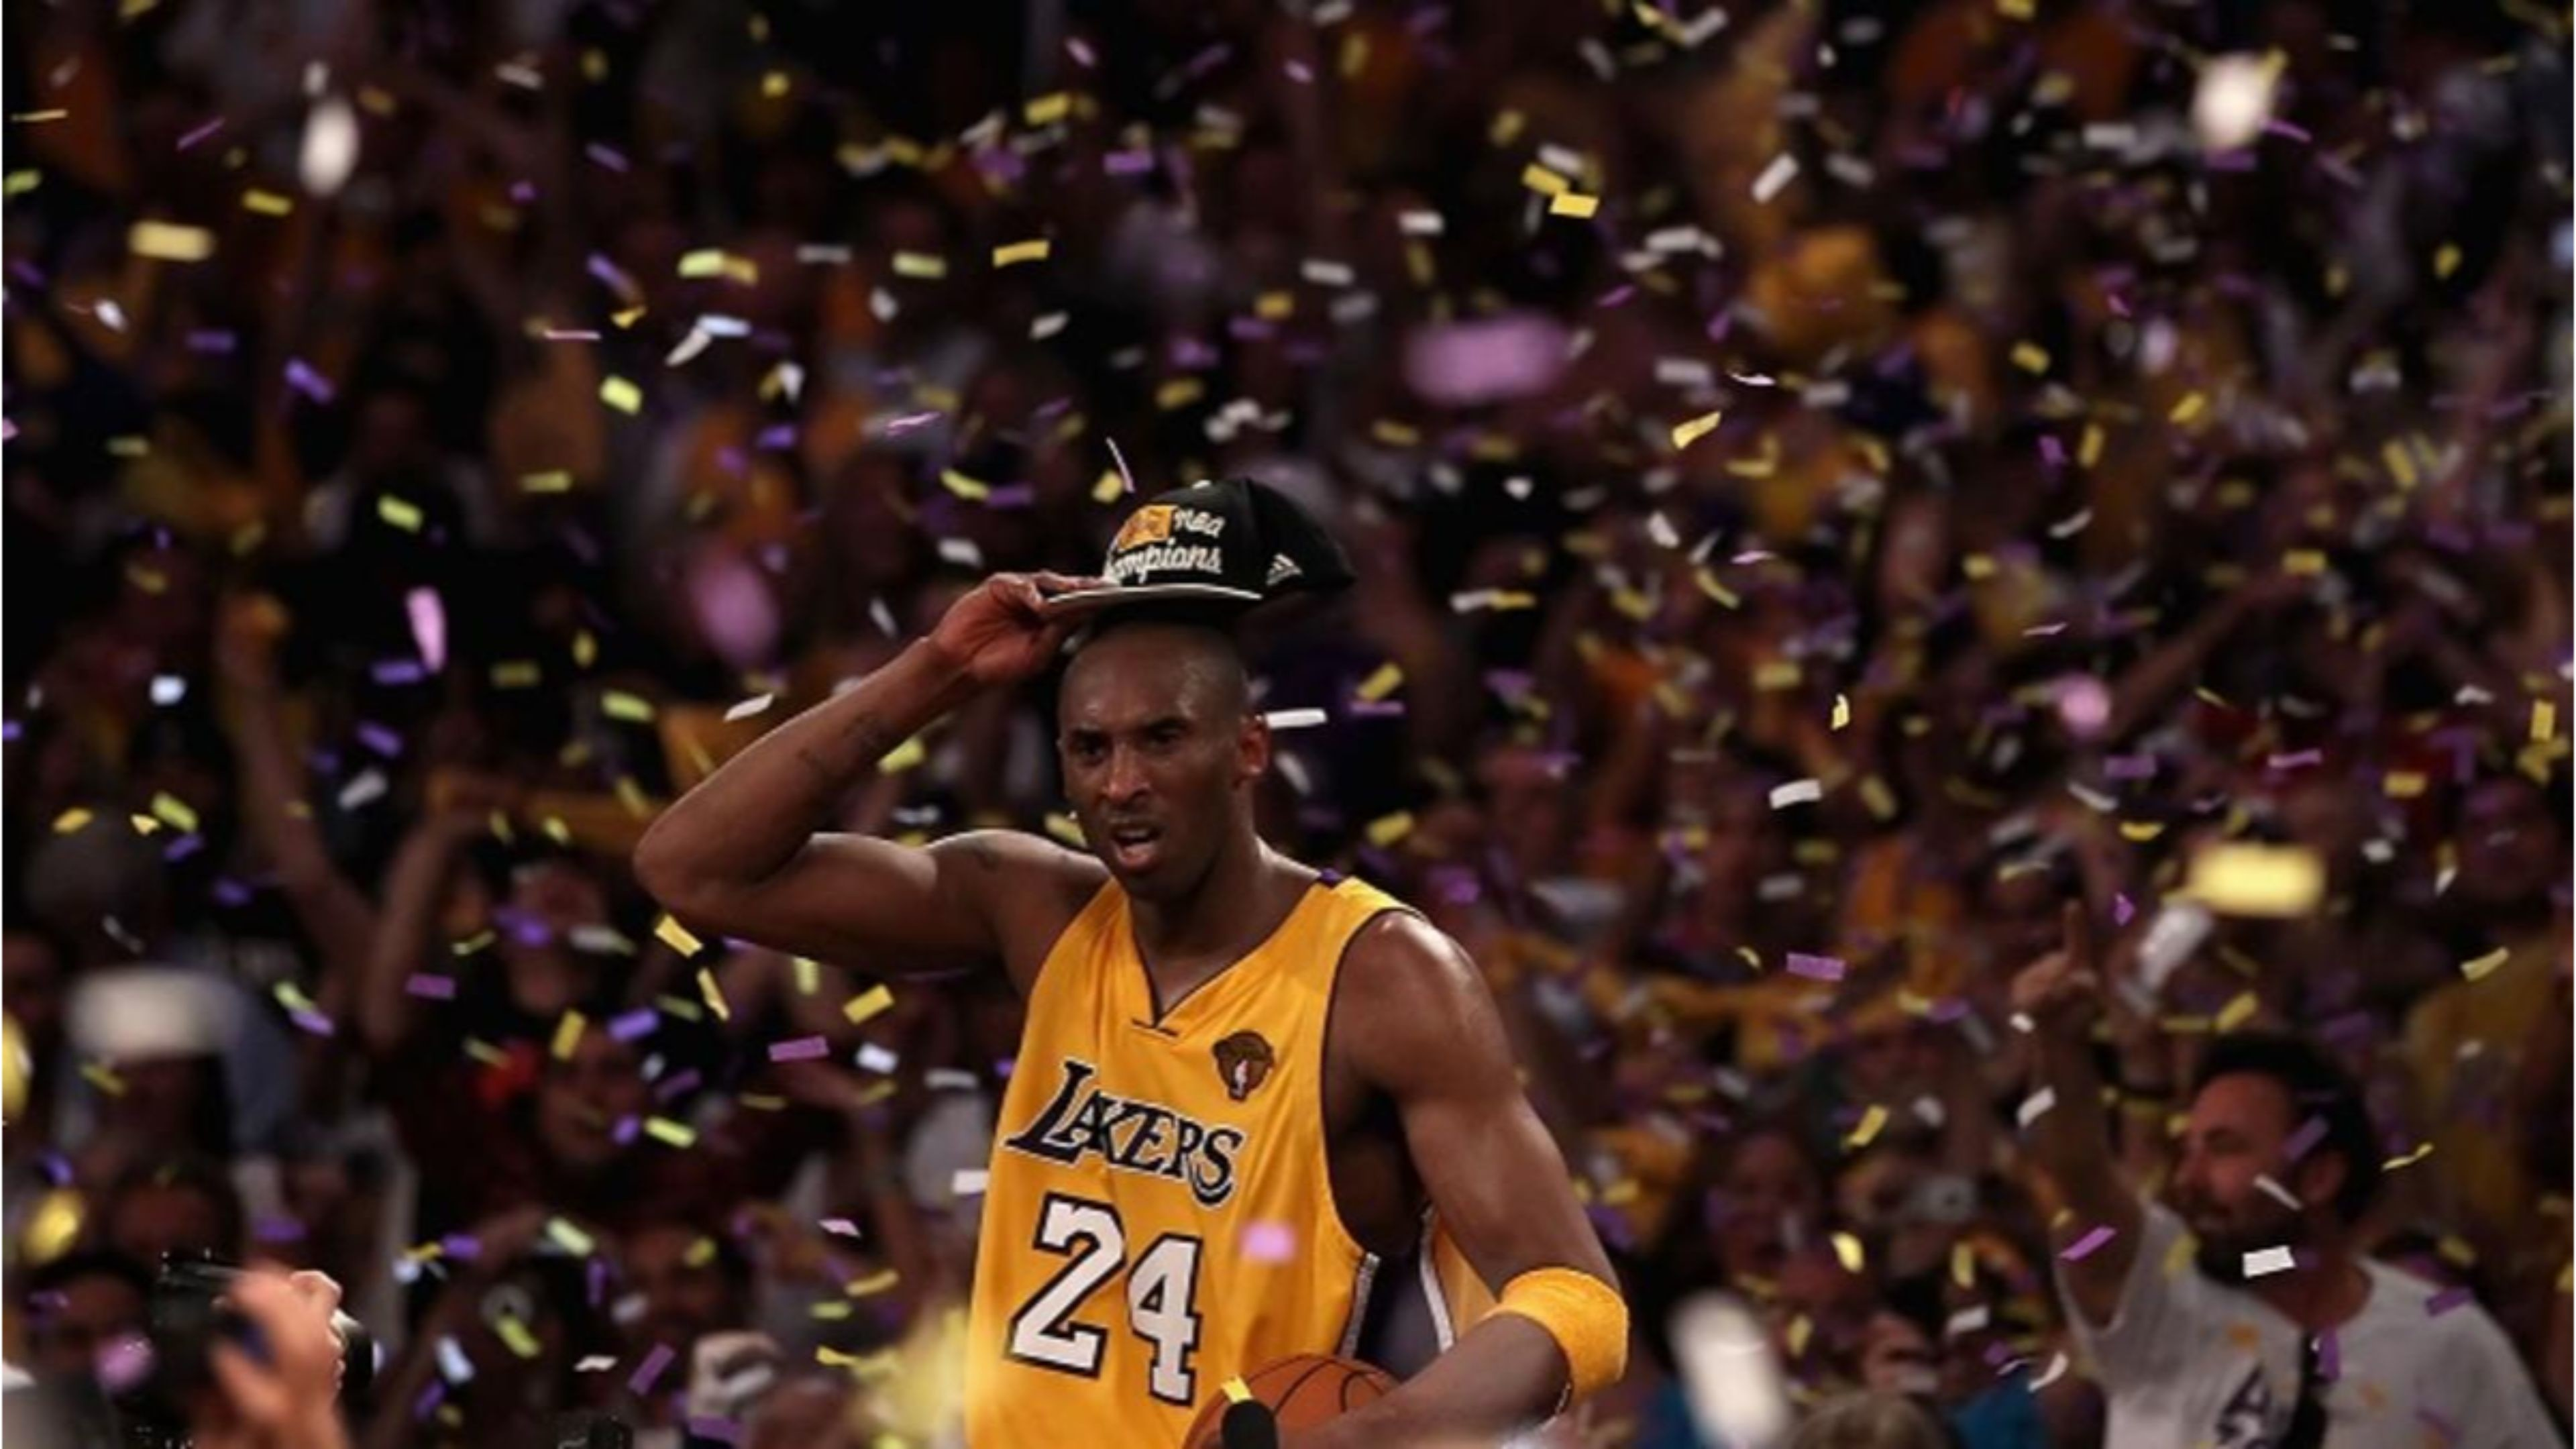 Res: 3840x2160, NBA Finals Champs La Lakers Kobe Bryant 4K Wallpaper